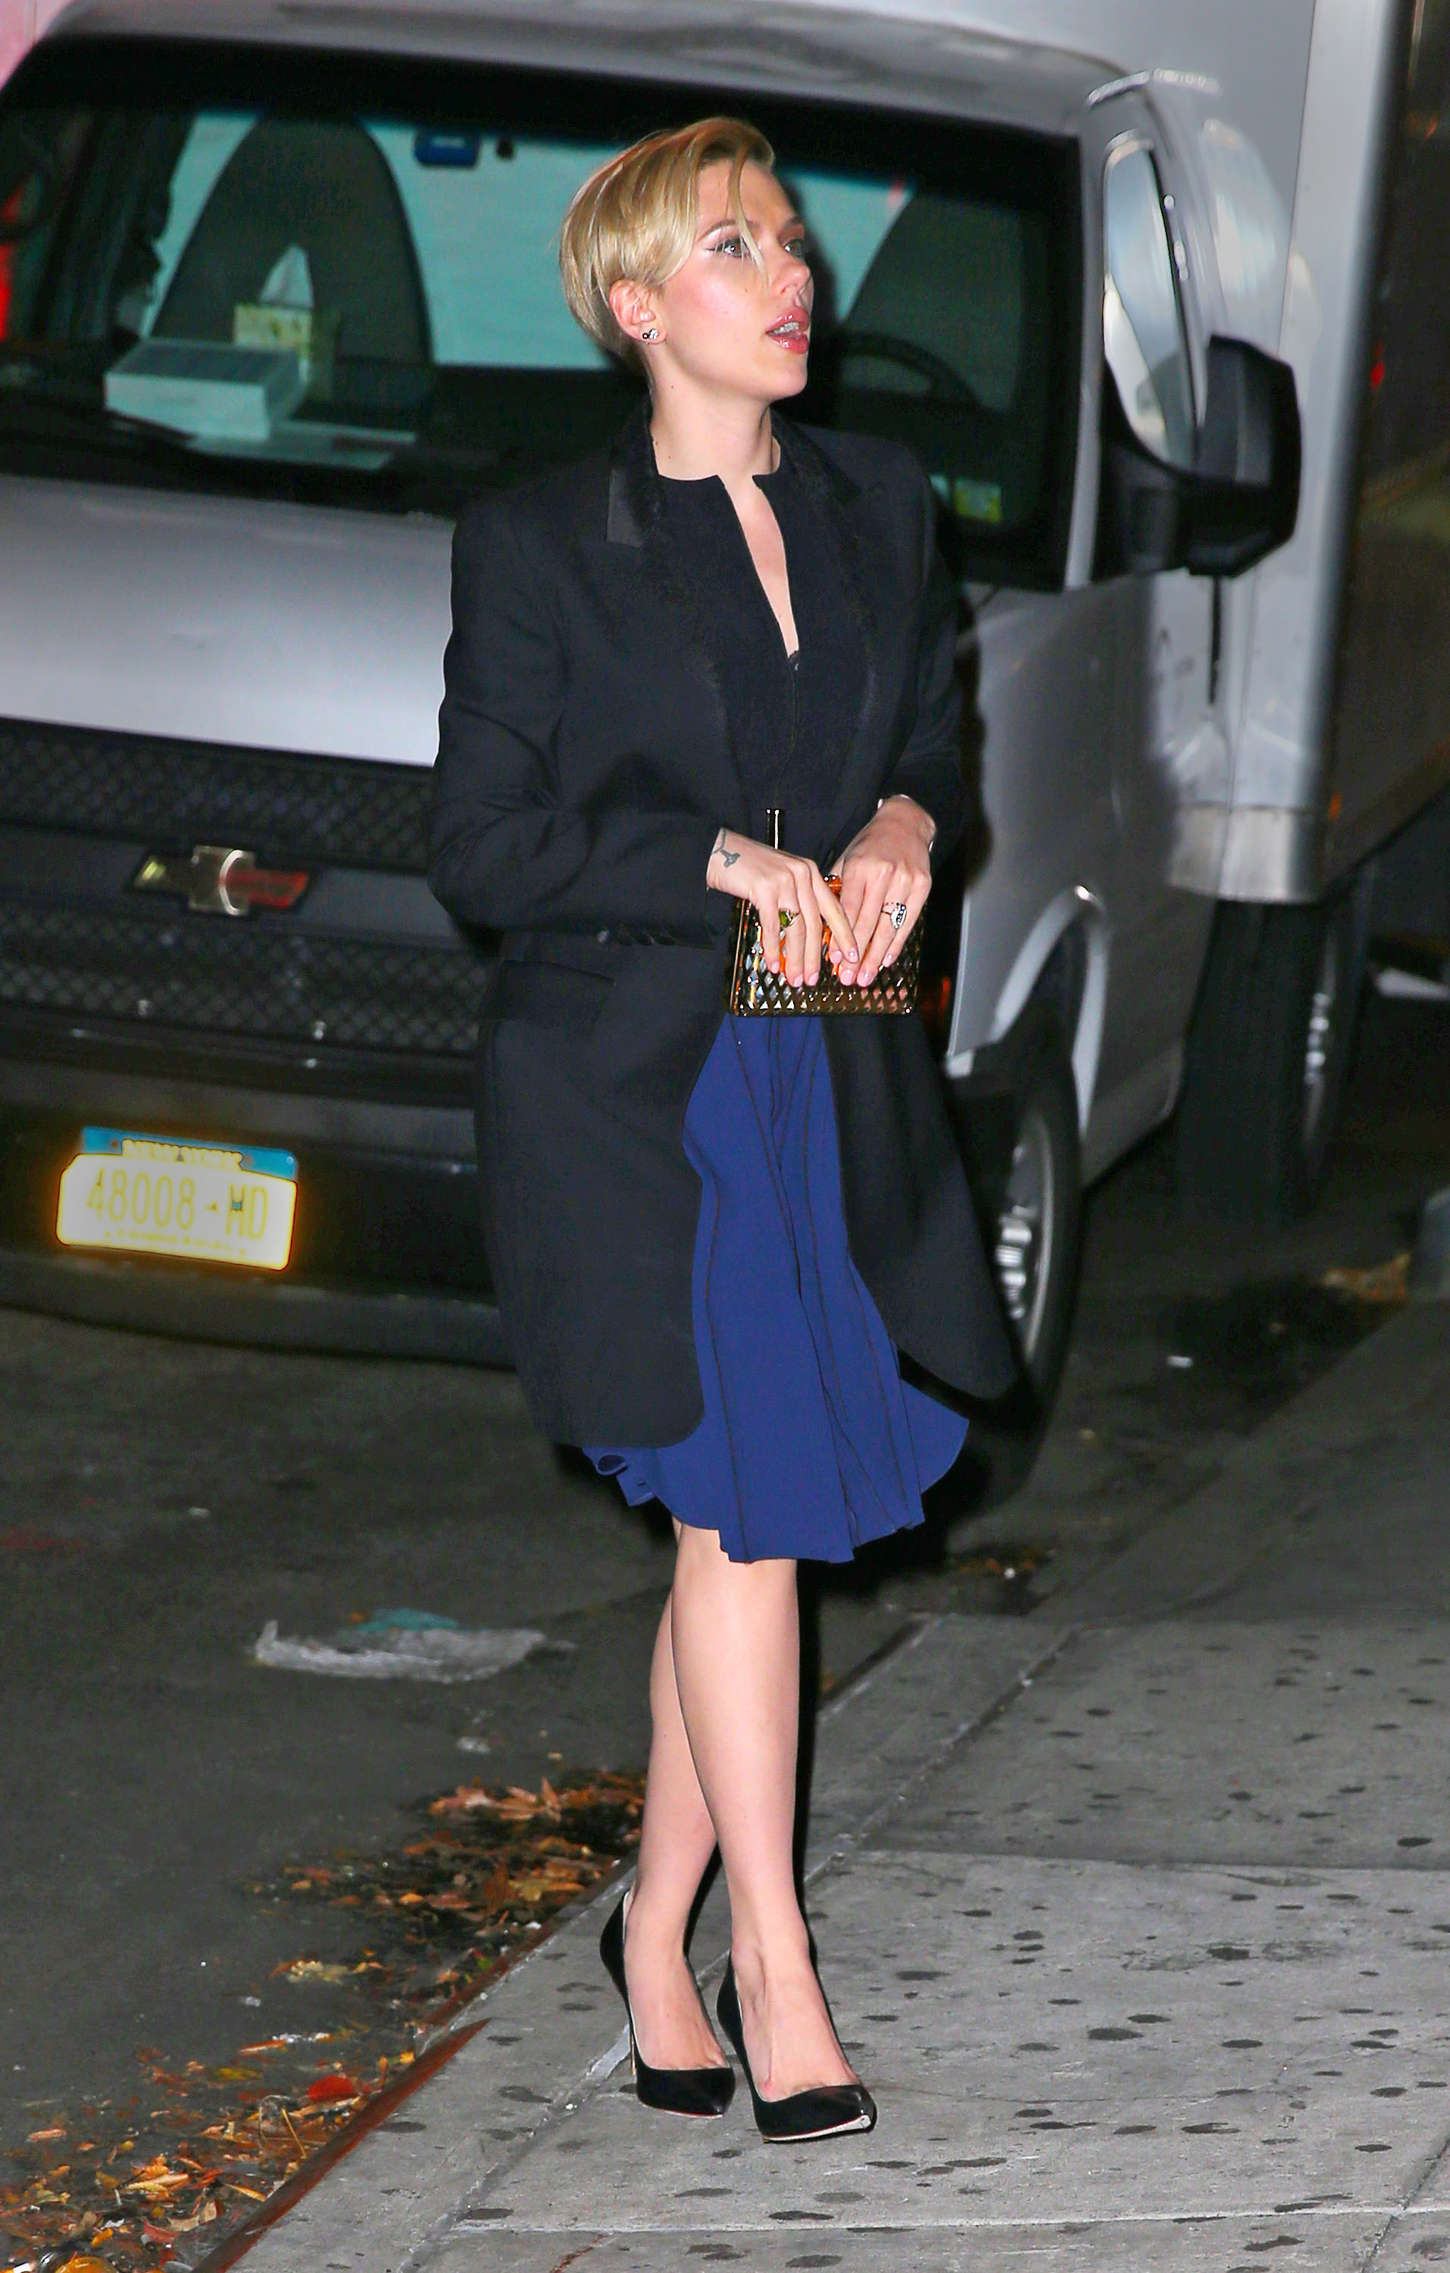 Scarlett Johansson 2014 : Scarlett Johansson in Blue Dress -02